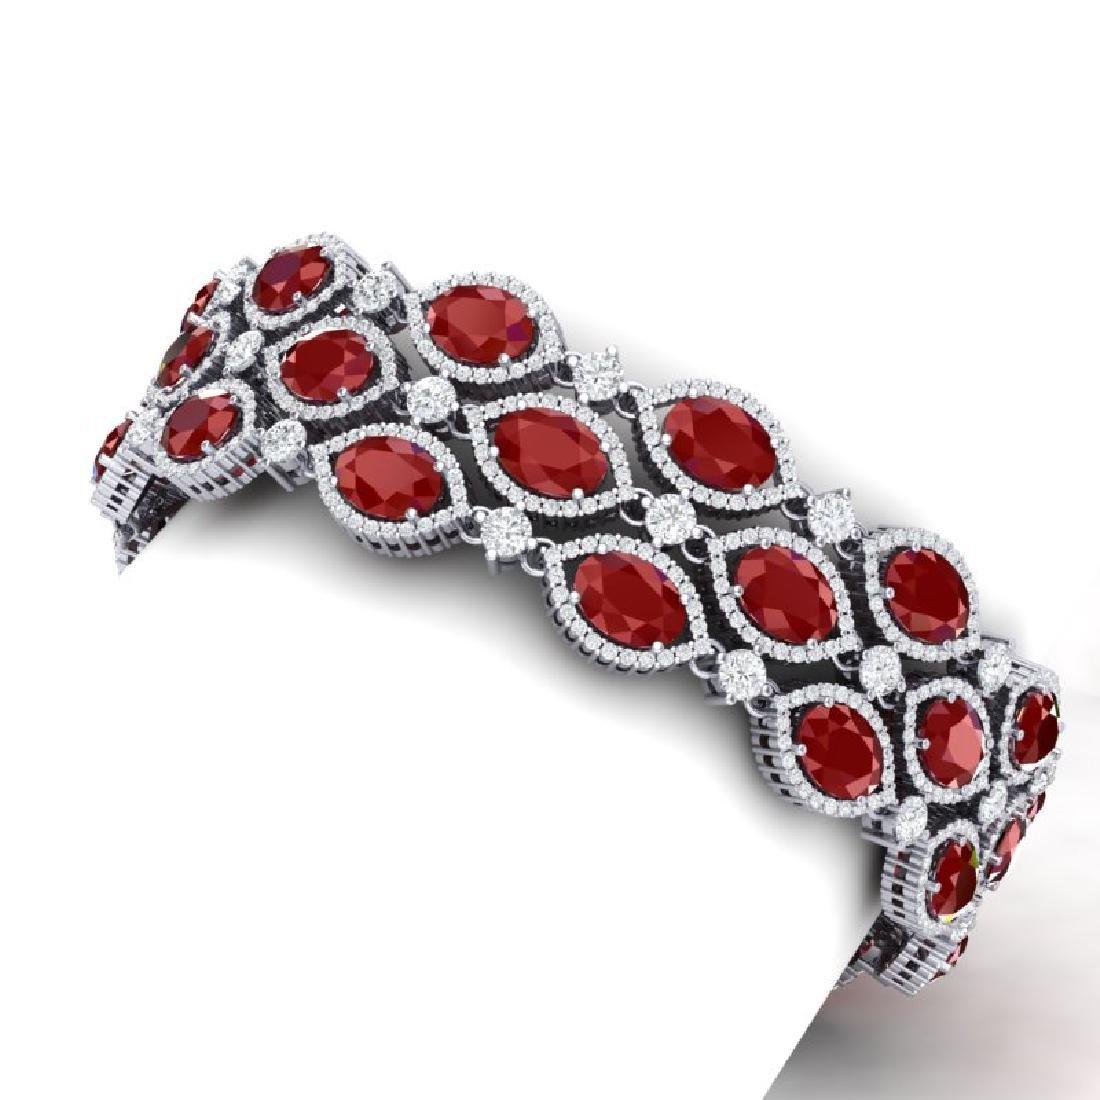 47.84 CTW Royalty Ruby & VS Diamond Bracelet 18K White - 2